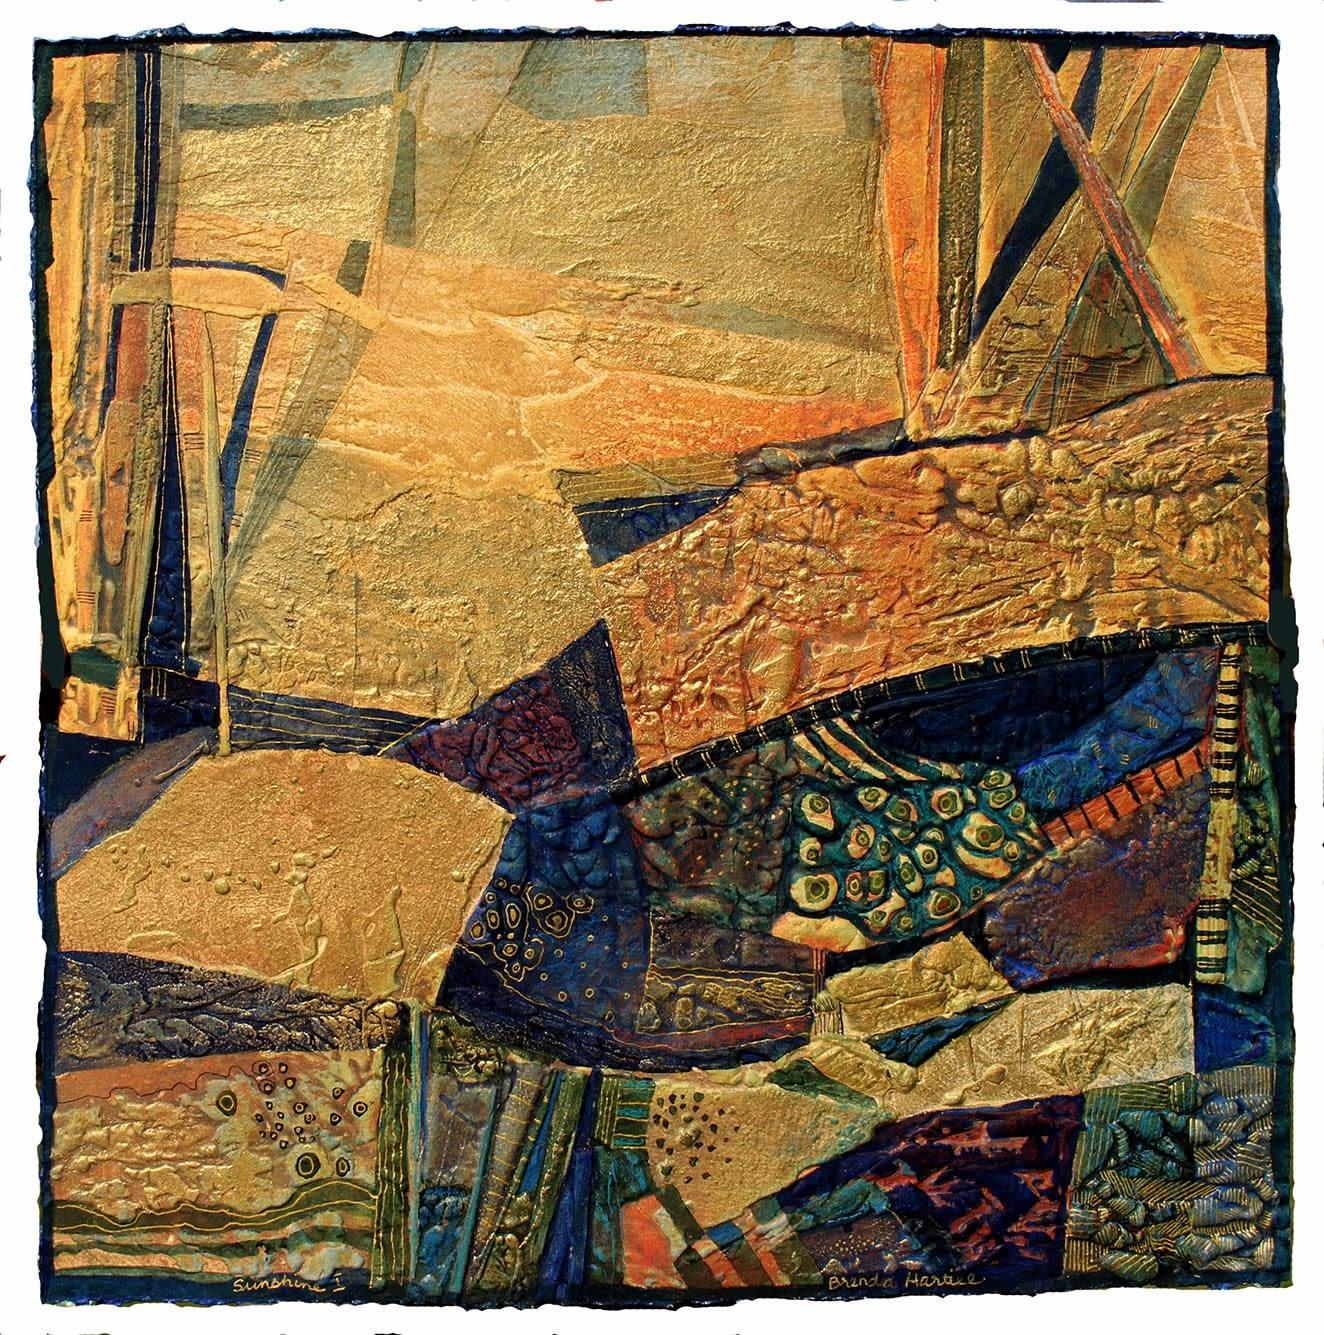 "<span class=""link fancybox-details-link""><a href=""/exhibitions/20/works/artworks_standalone10818/"">View Detail Page</a></span><div class=""artist""><span class=""artist""><strong>Brenda Hartill RE</strong></span></div><div class=""title""><em>Sunshine I</em></div><div class=""medium"">collagraph/mixedmedia<br></div><div class=""dimensions"">50 x 50 cm image size<br></div><div class=""edition_details"">unique</div>"